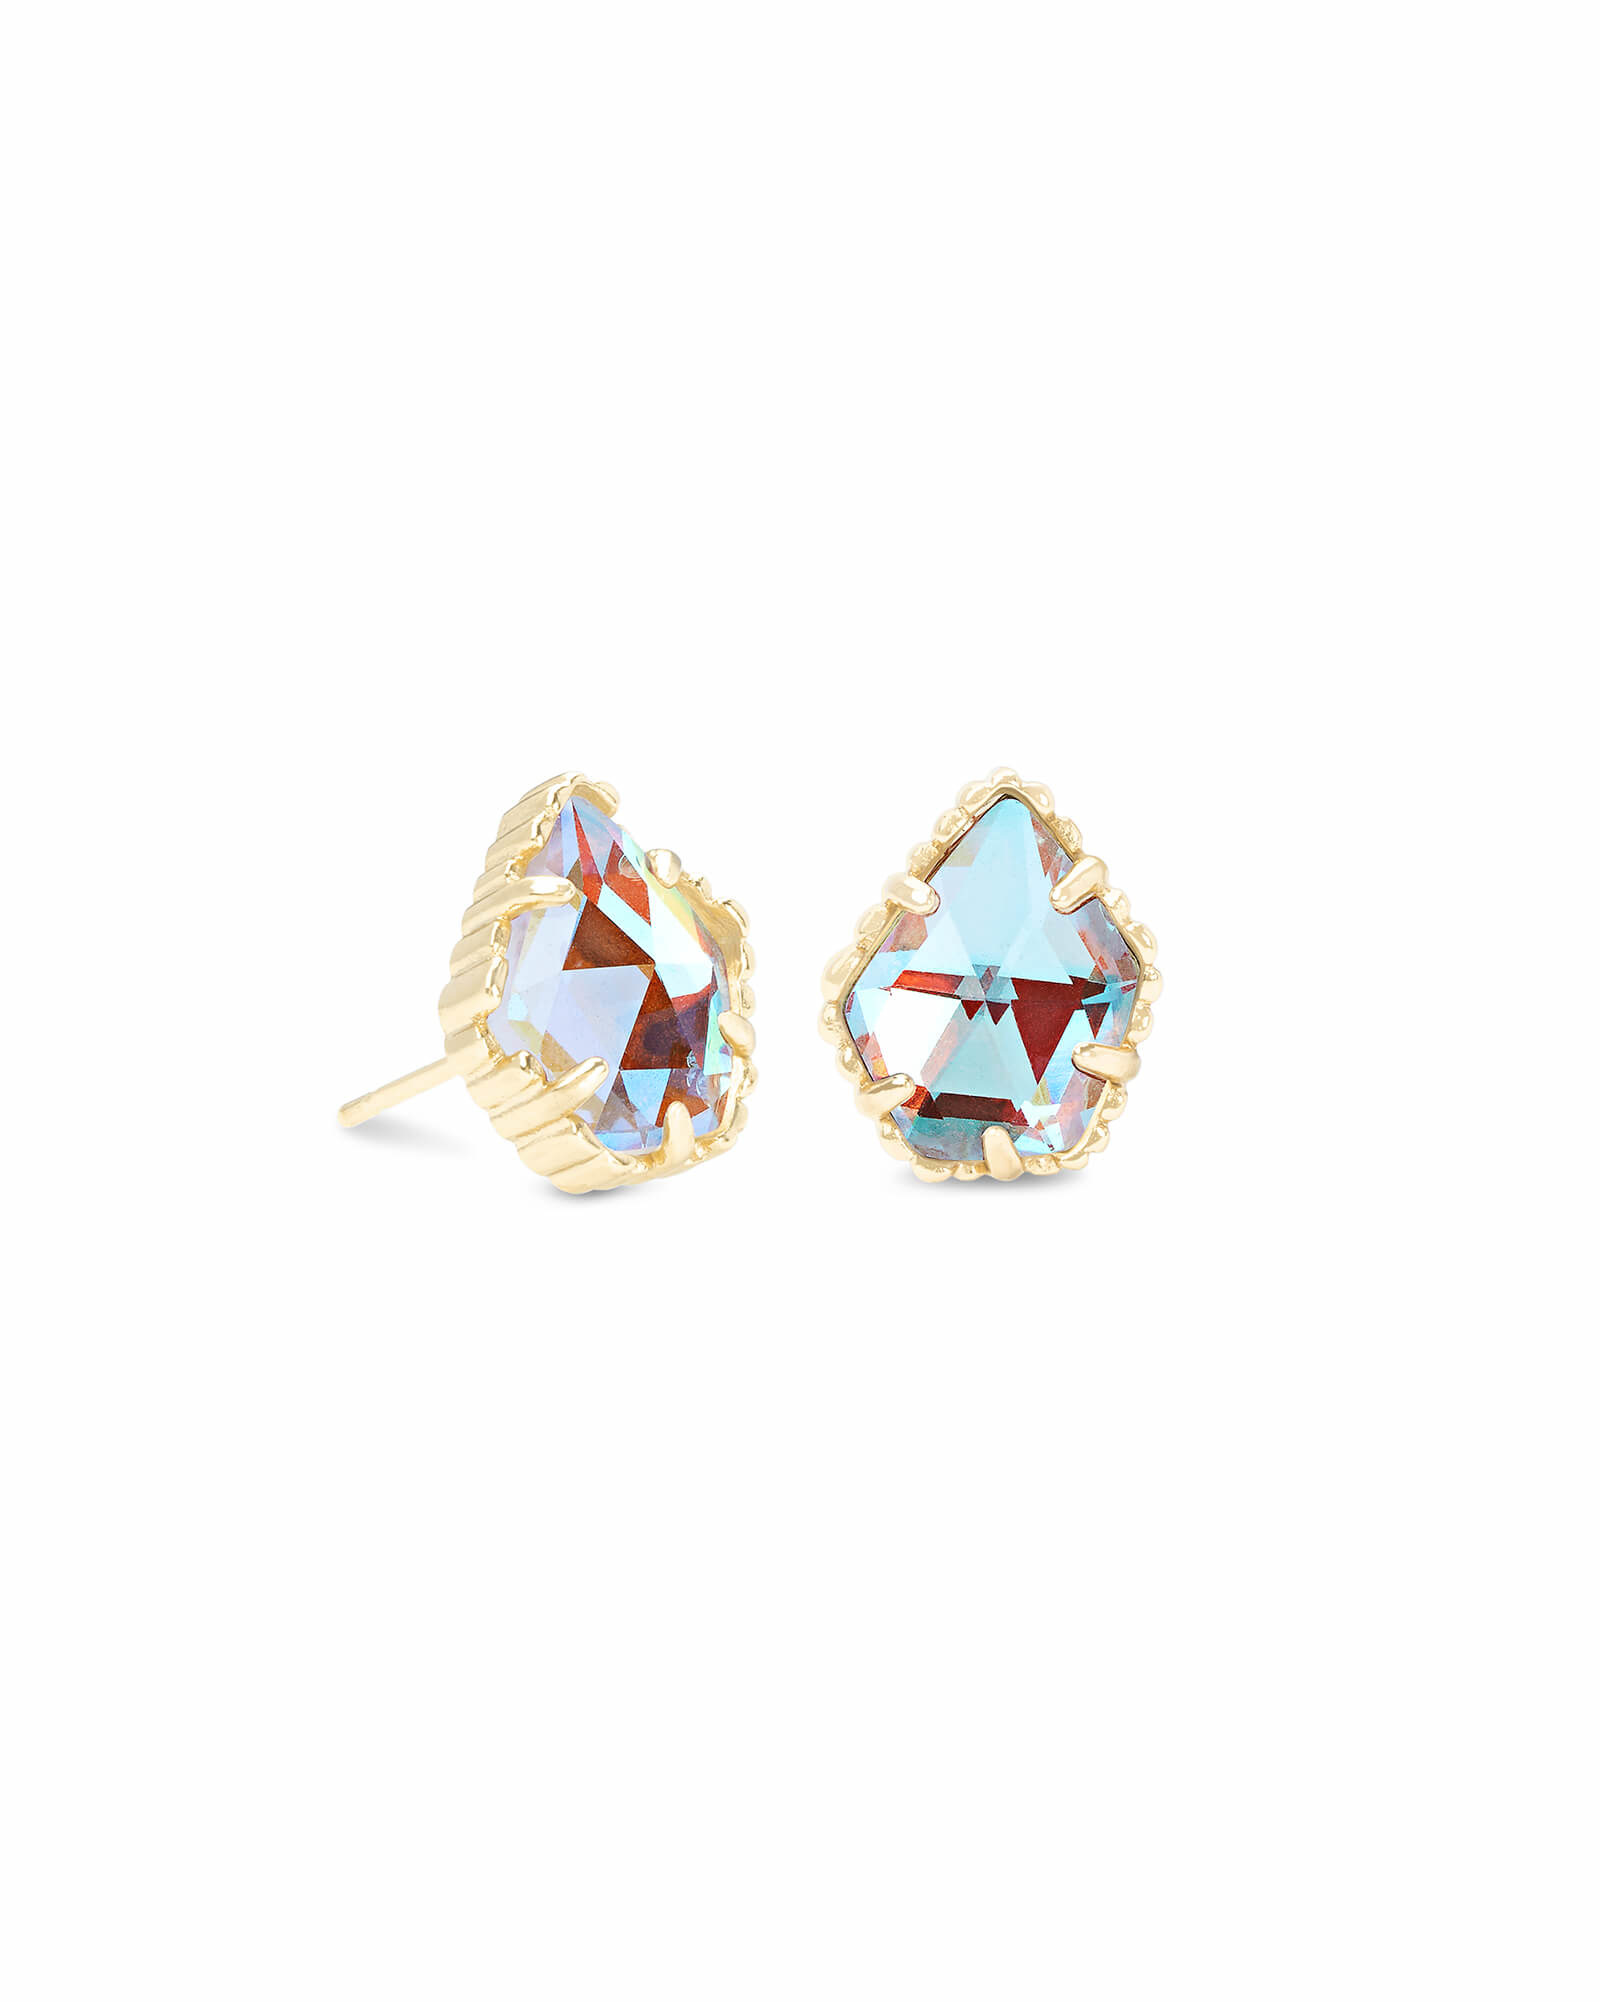 Tessa Earring in Gold DIchroic Glass